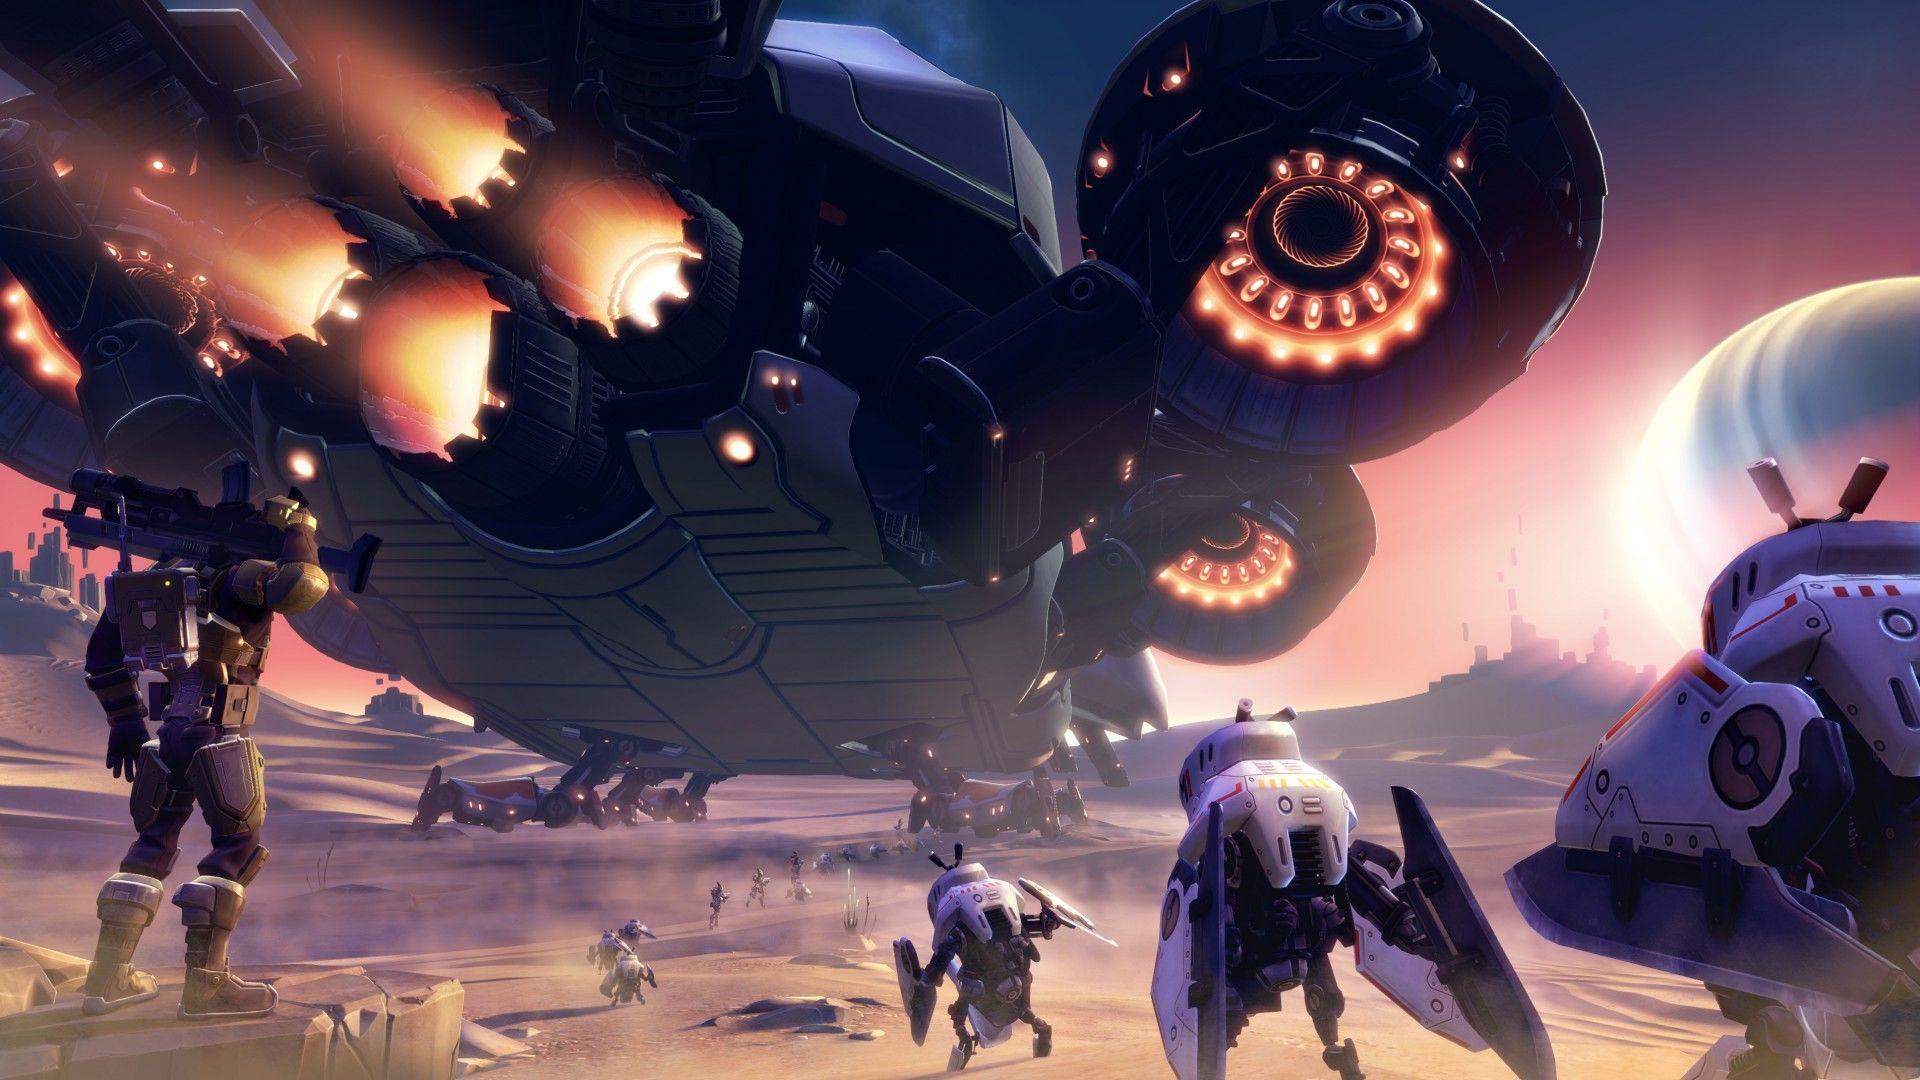 Battleborn, 2015, Game, Fps, MOBA, Sci-fi, Space, Shooter